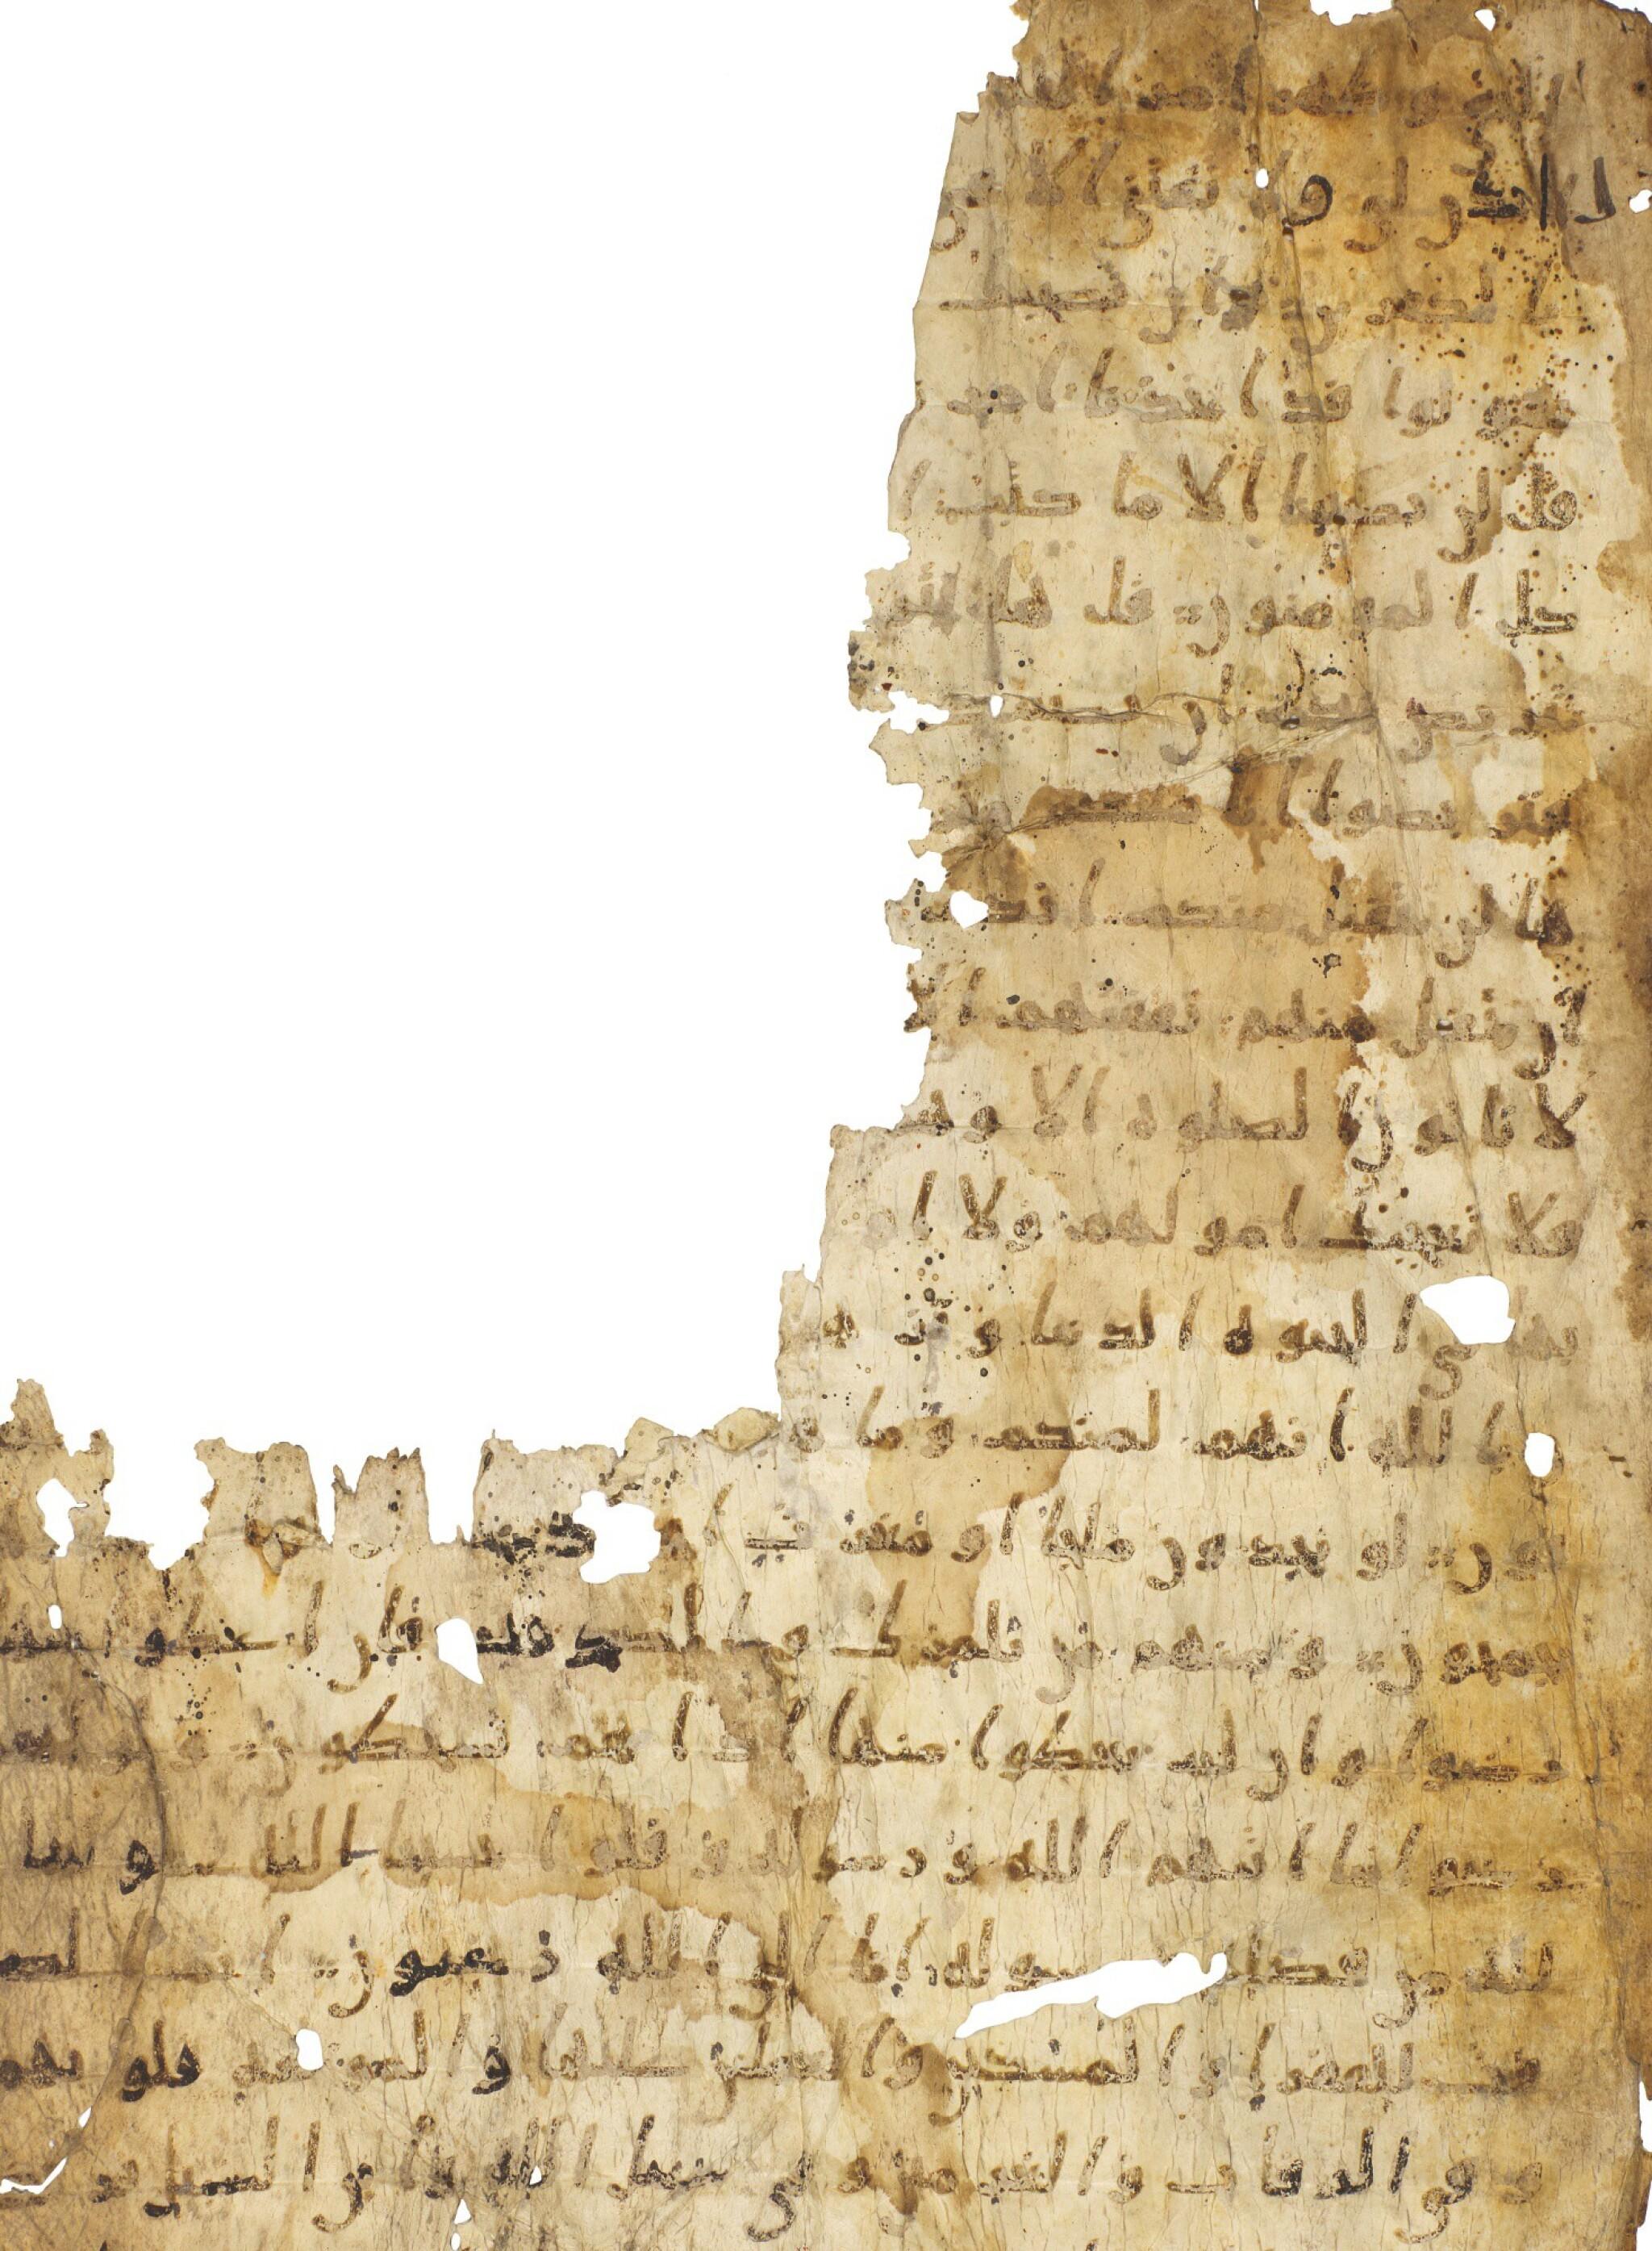 View full screen - View 1 of Lot 104. AN EARLY QUR'AN LEAF IN HIJAZI SCRIPT ON VELLUM, ARABIAN PENINSULA, SECOND HALF 7TH CENTURY AD.